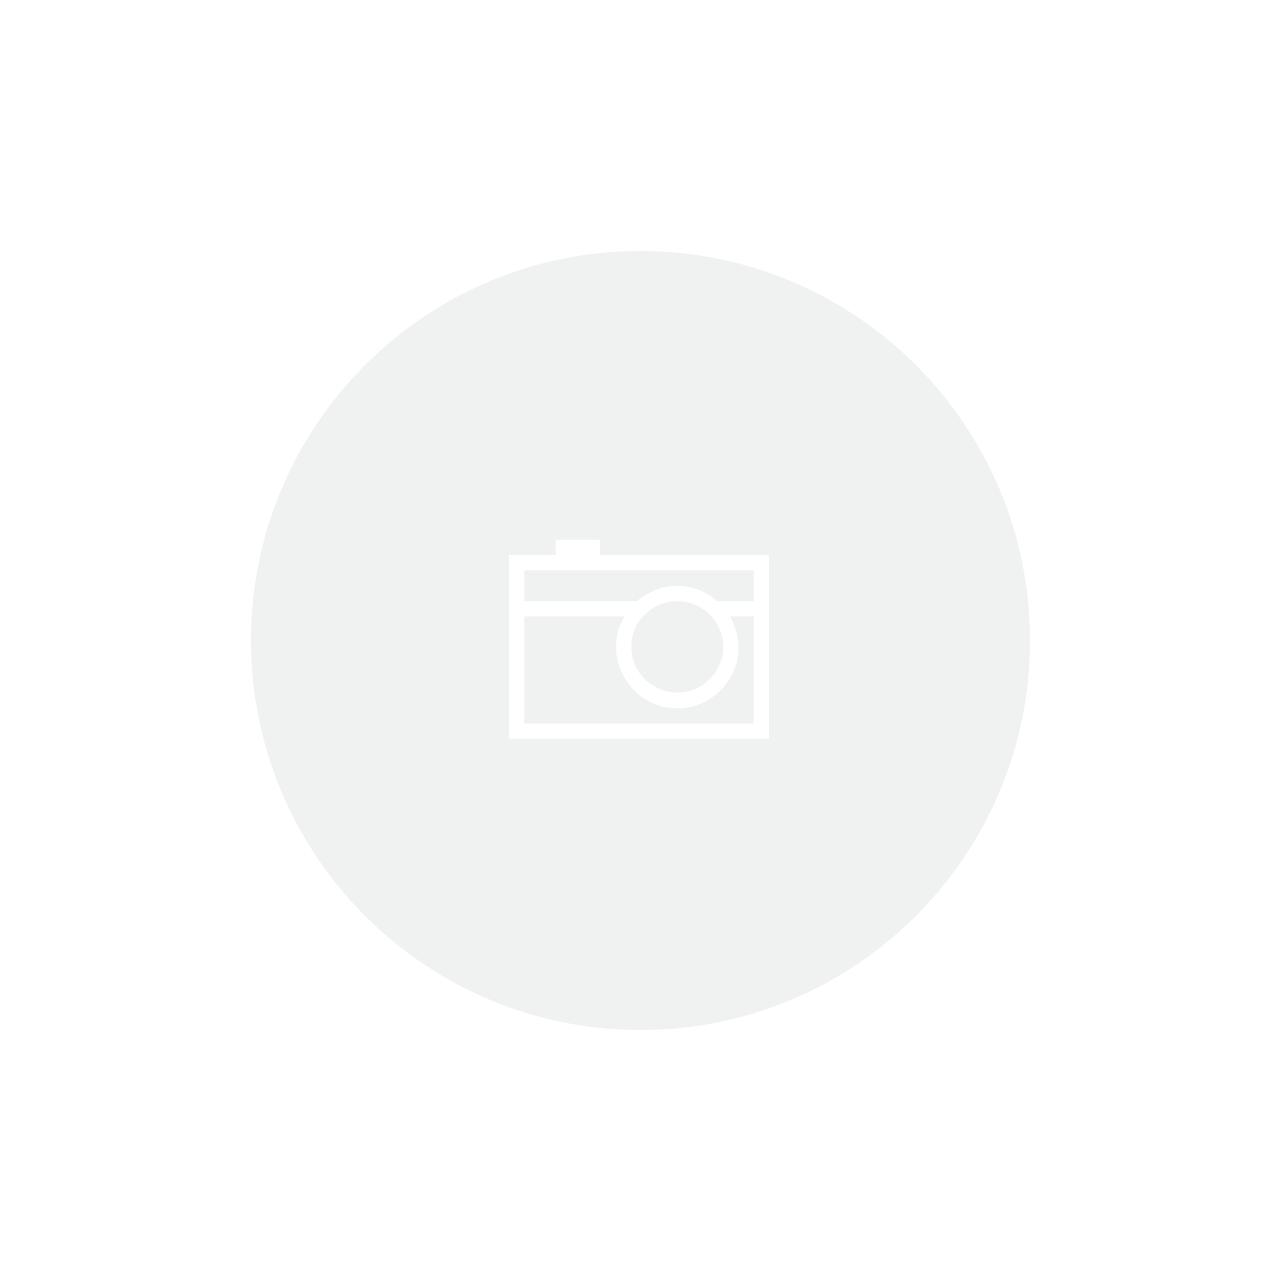 Forma para Pao e Bolo 30 cm Starflon Brasil Tramontina